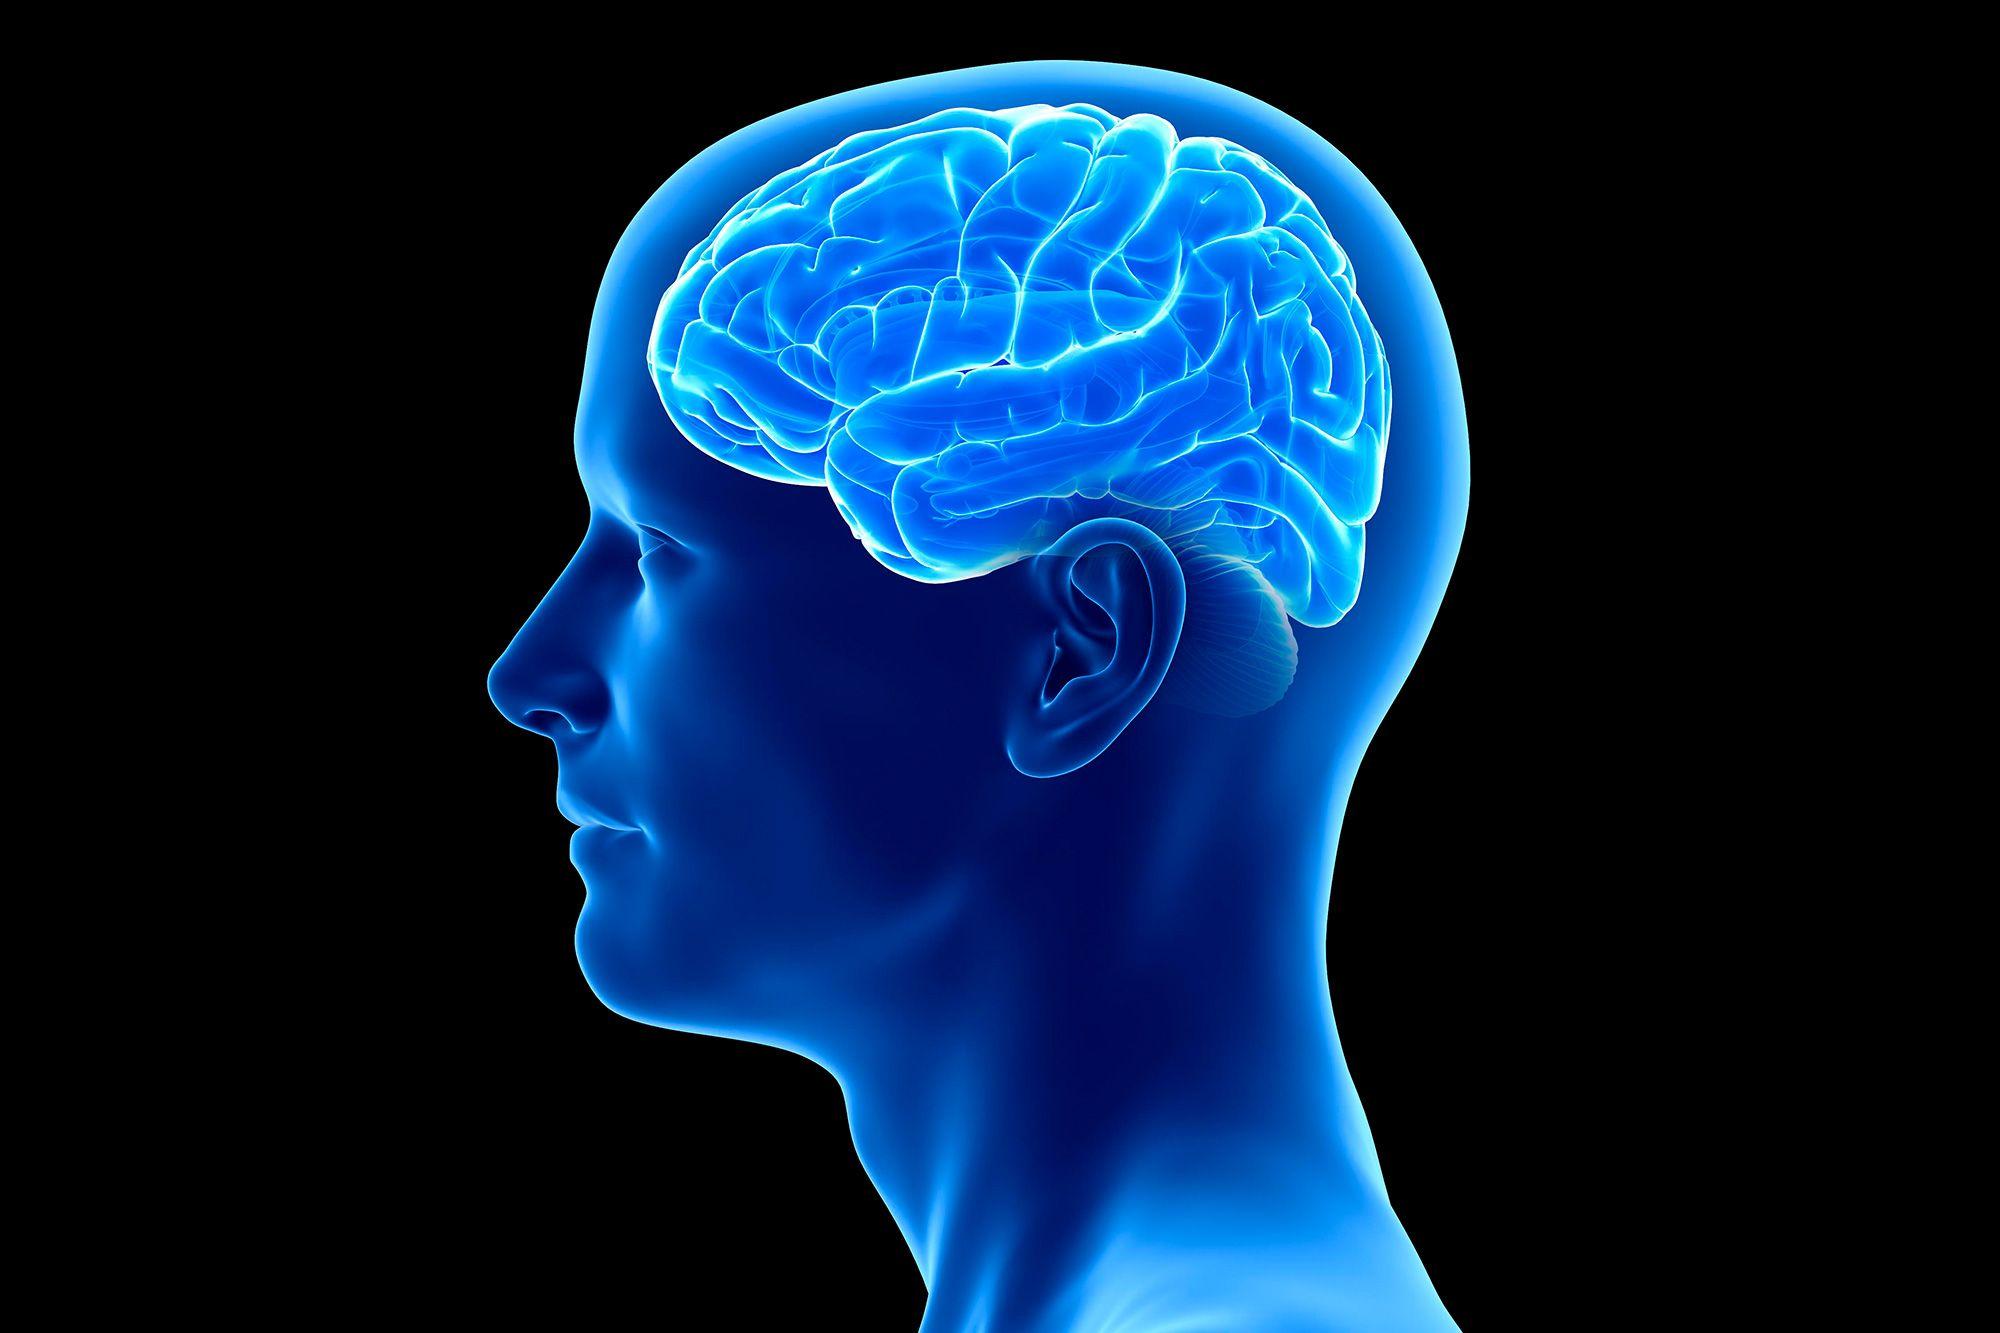 Coronavirus can the brain and replicate, new study claims